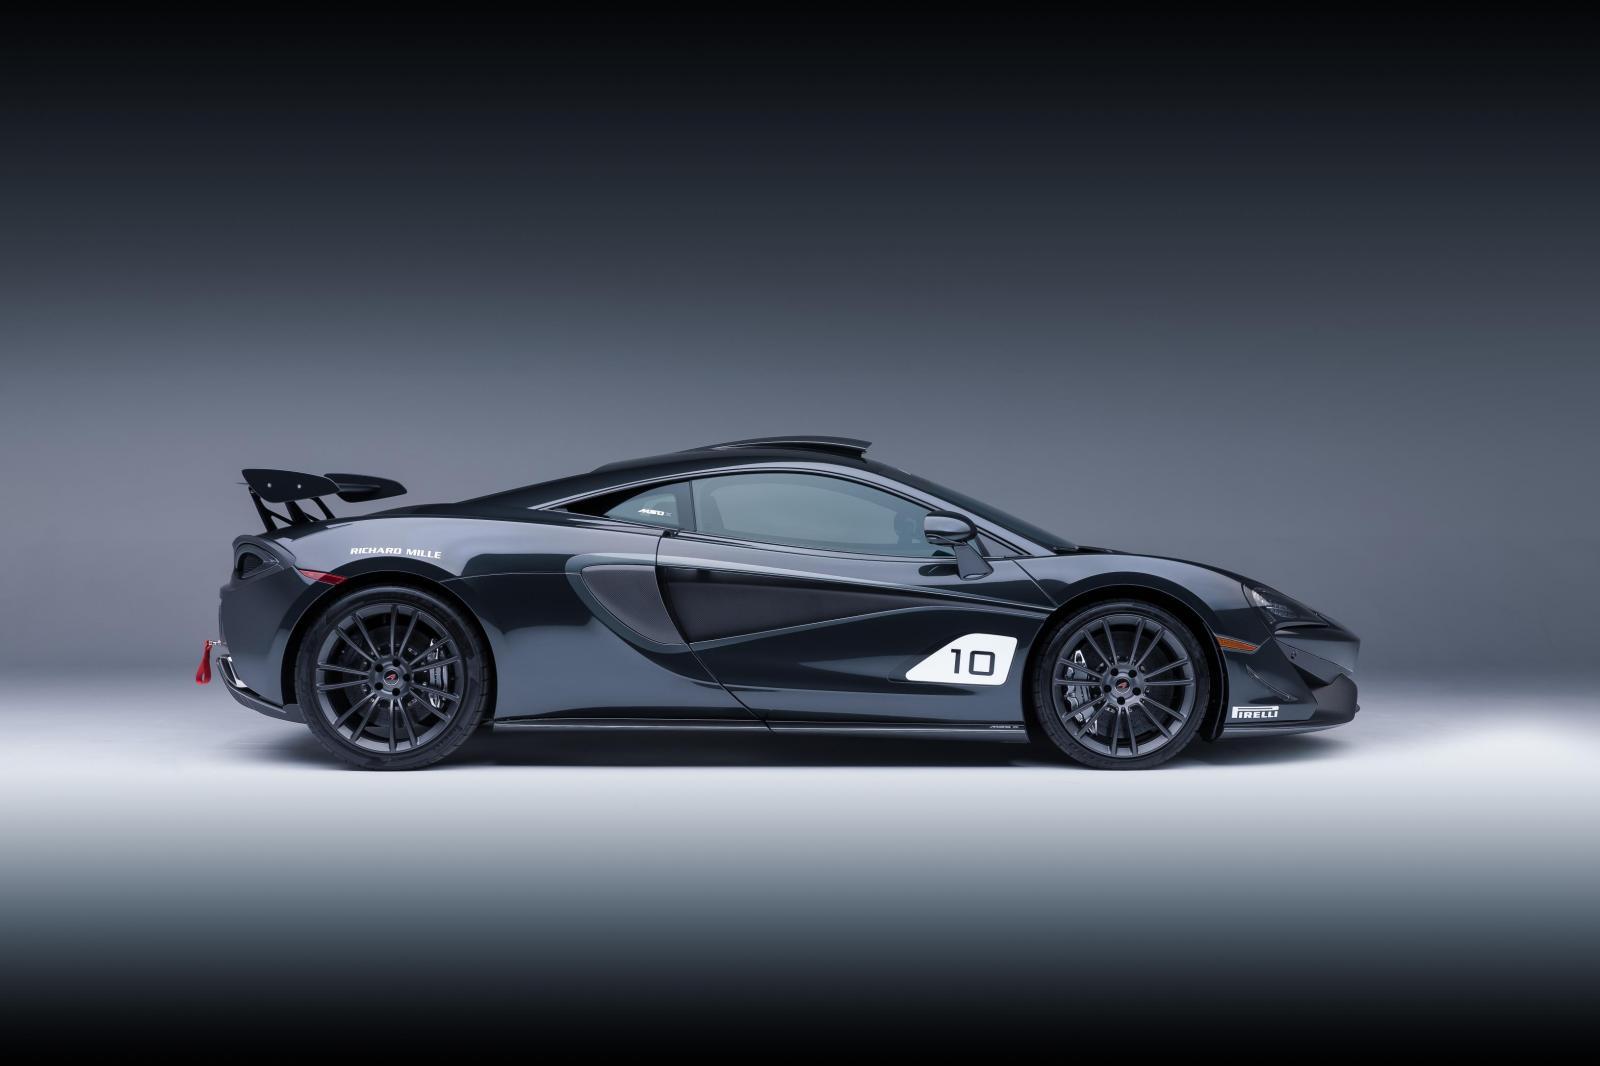 Aerodinamica coches coche deportivo de color negro